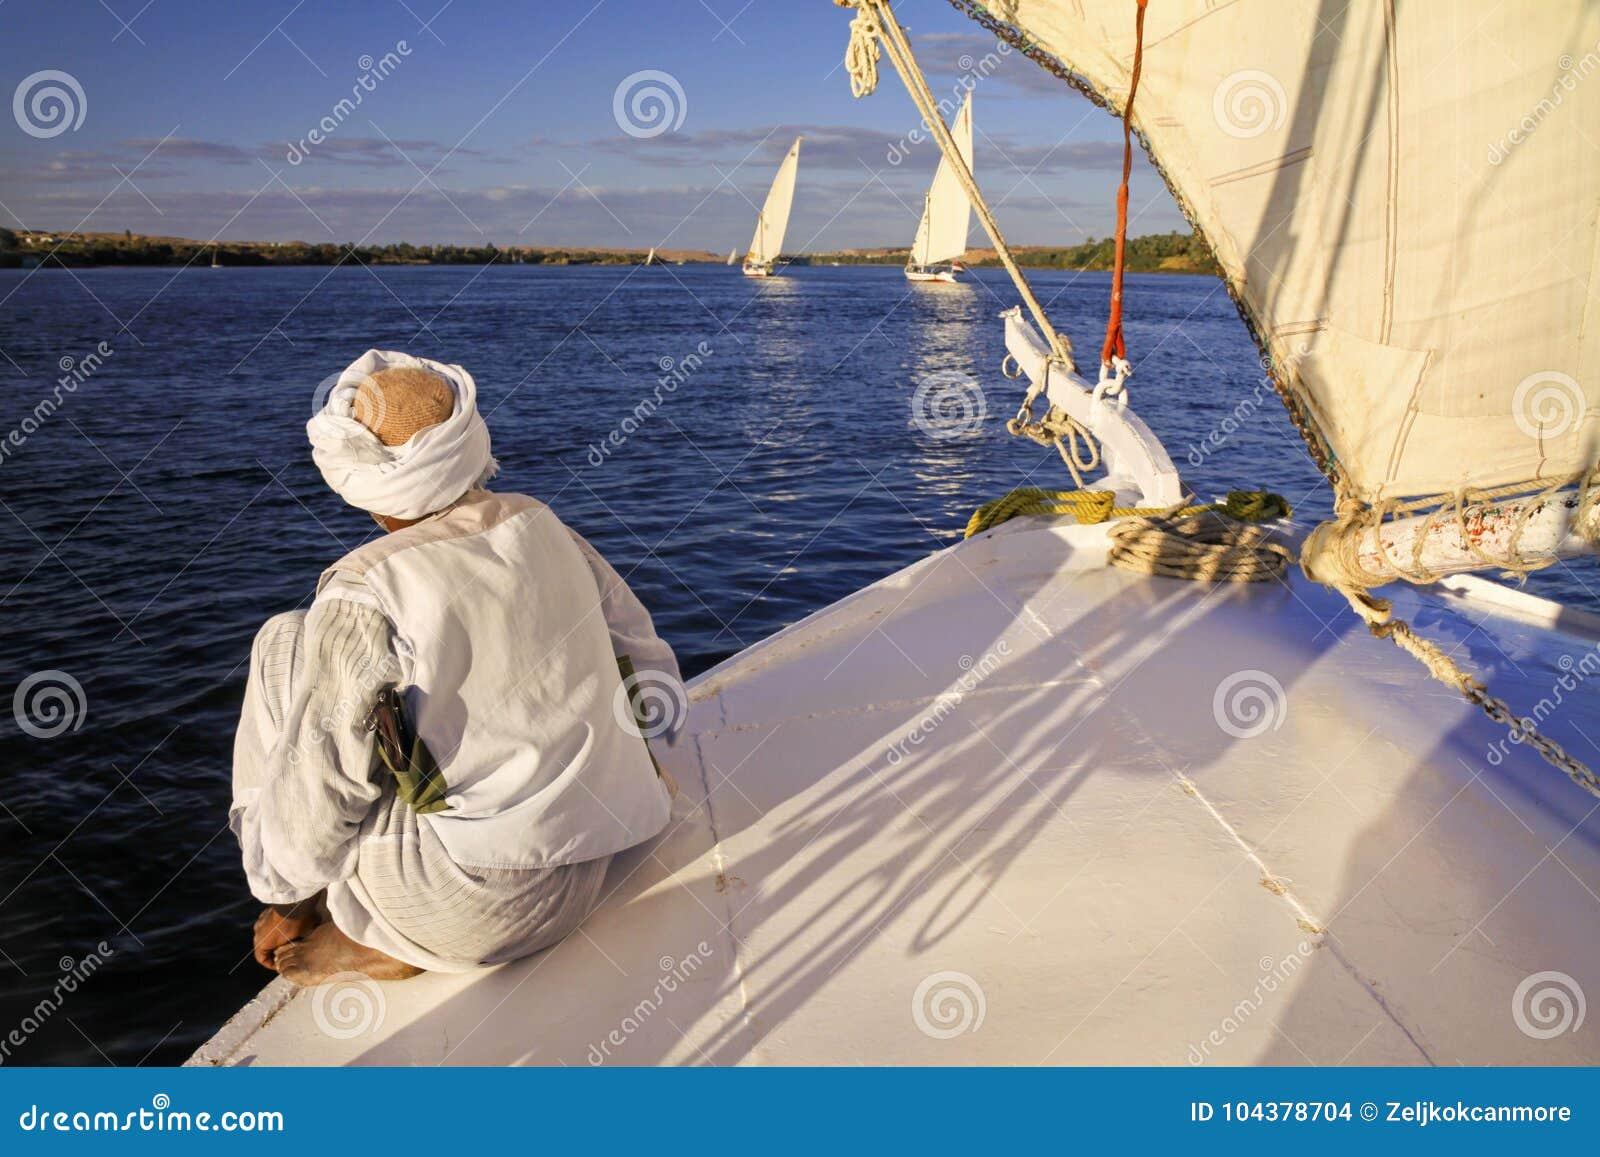 Nubian-Mann-Segeln auf Nile River in Assuan Ägypten